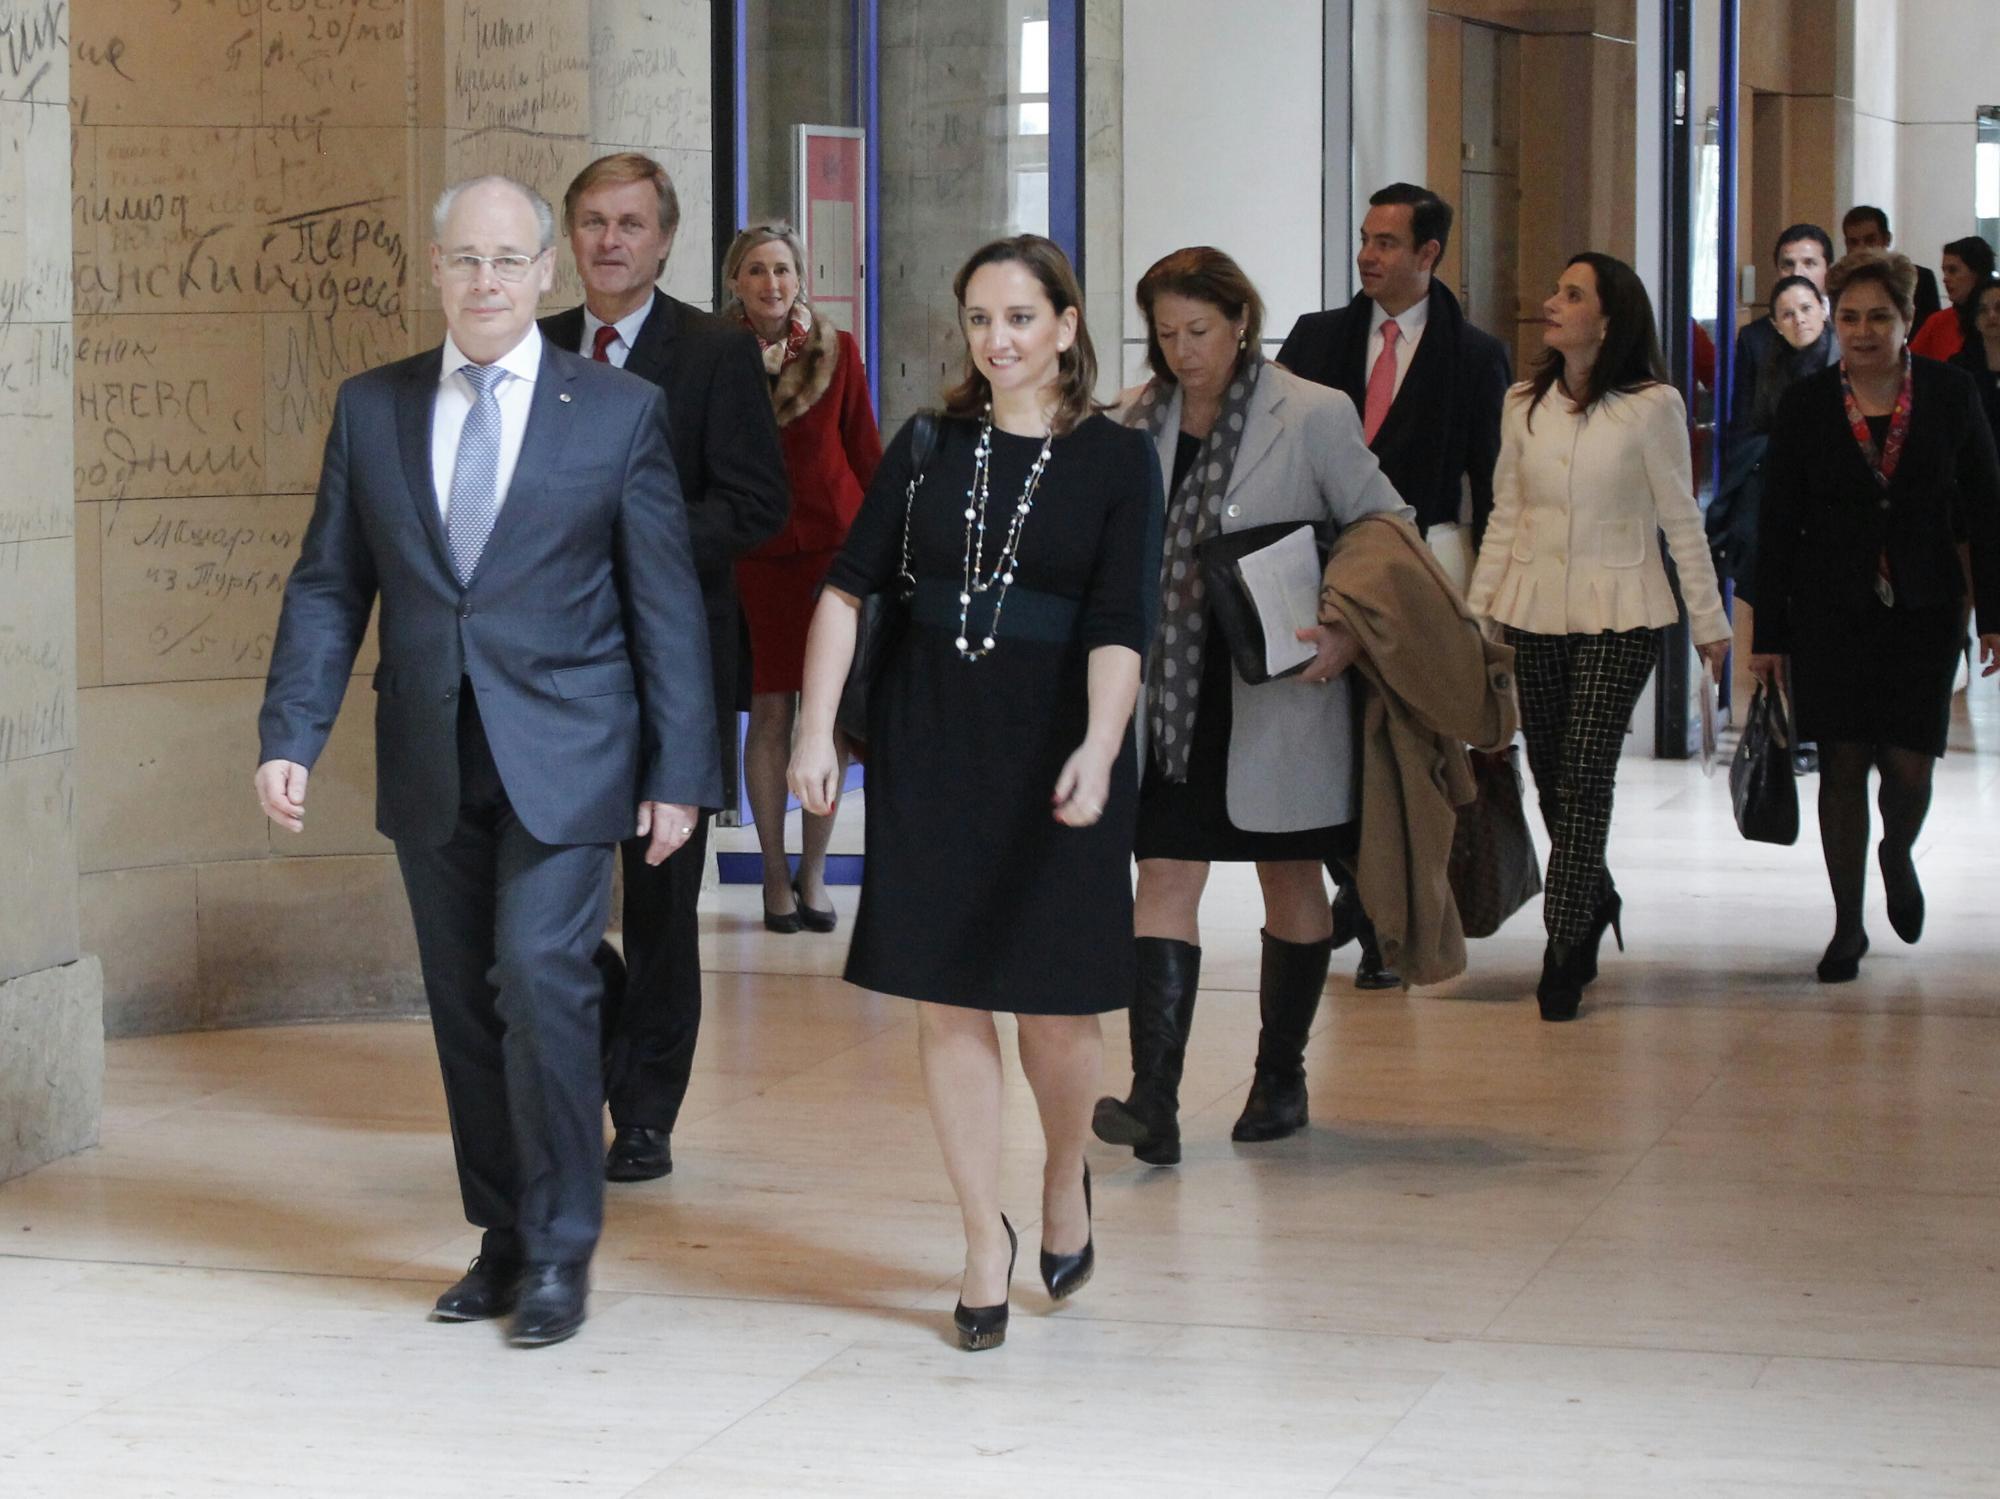 FOTO 5 Canciller Claudia Ruiz Massieu se reuni  con Diputados del Parlamento Federal de Alemania.jpg